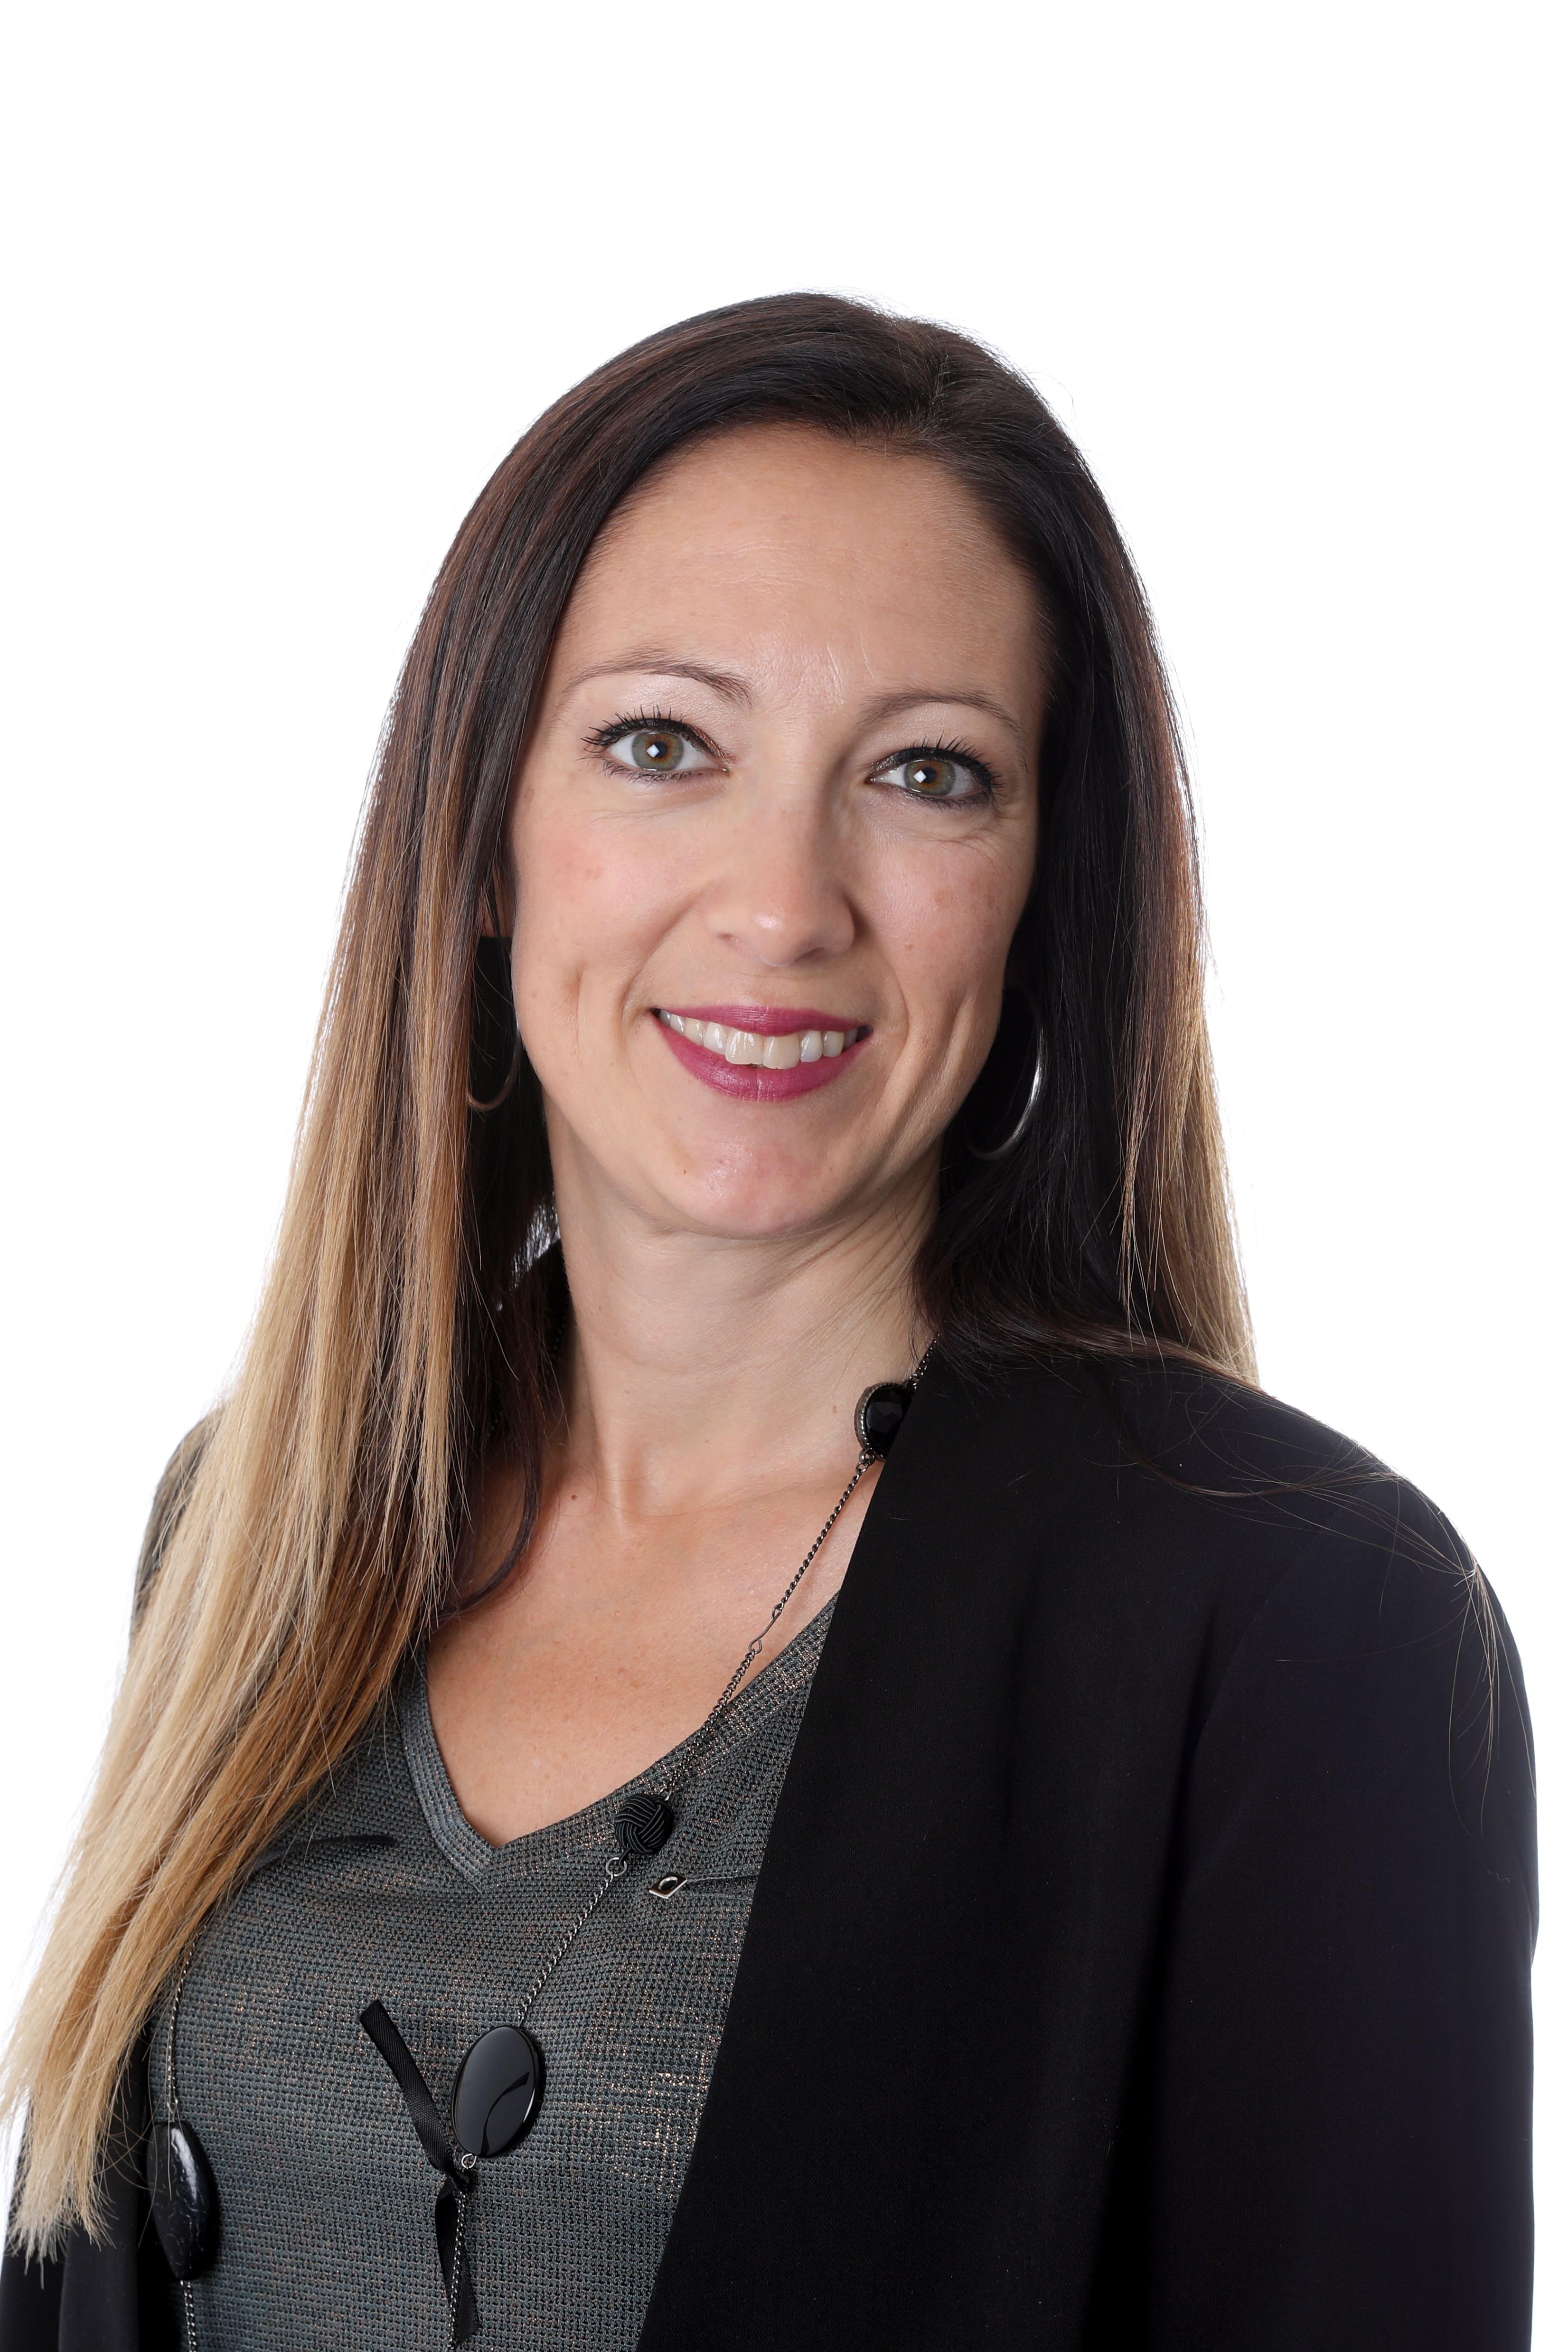 Nathalie Pignat